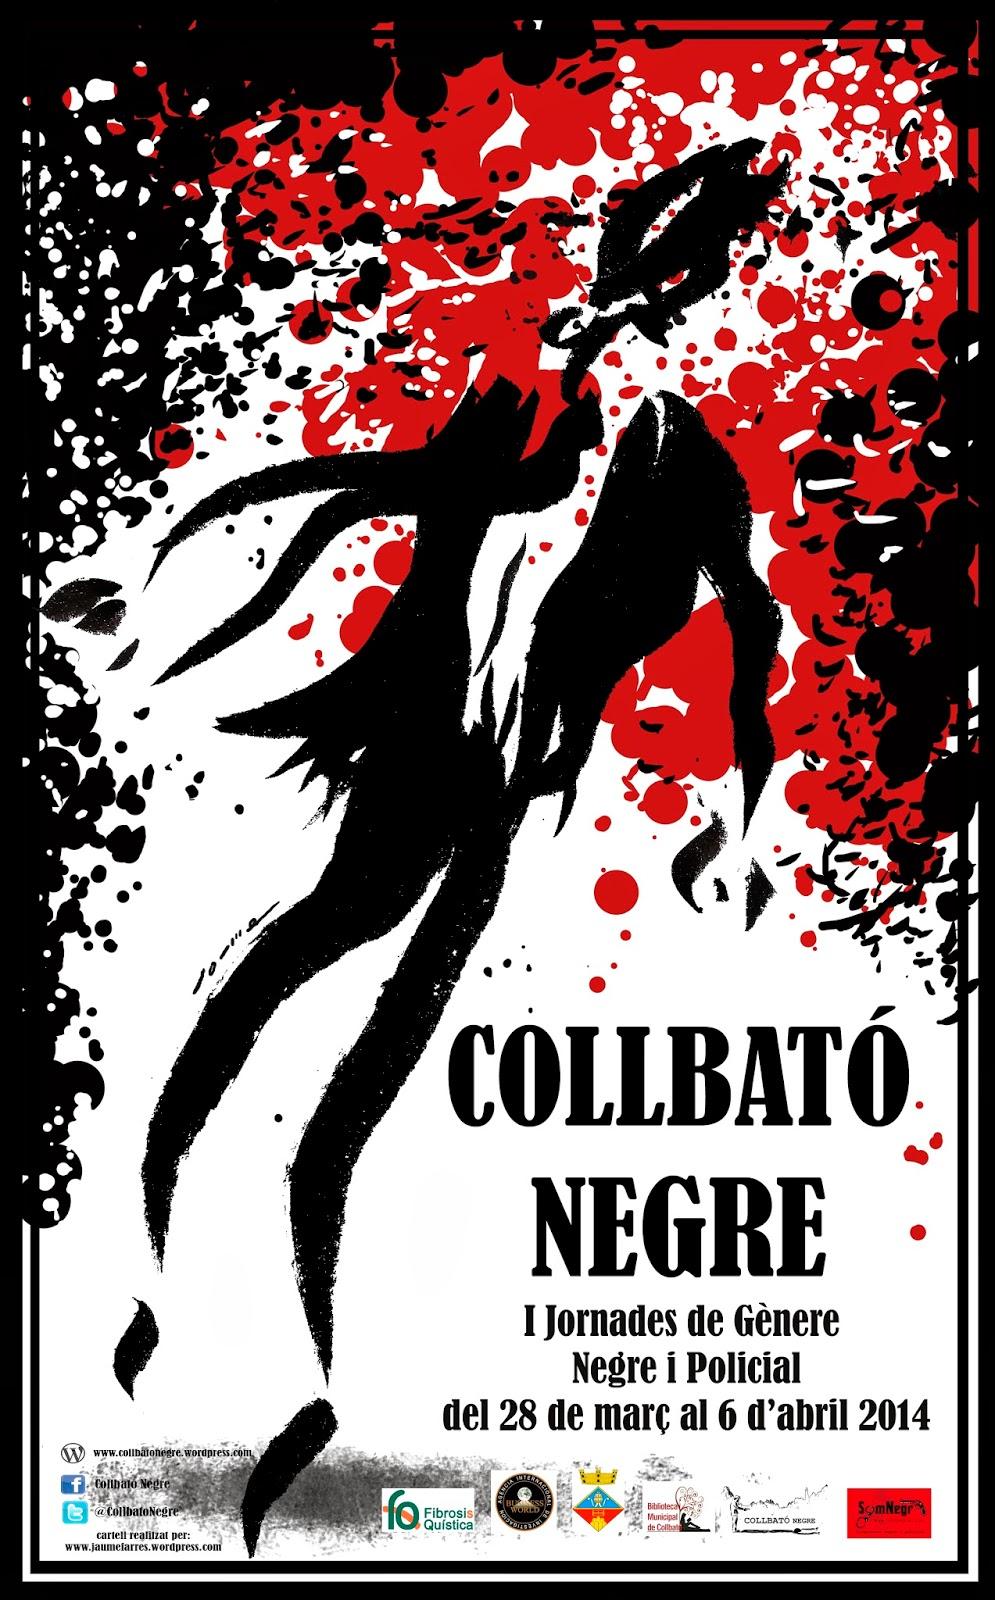 http://collbatonegre.wordpress.com/jornadas-negras/